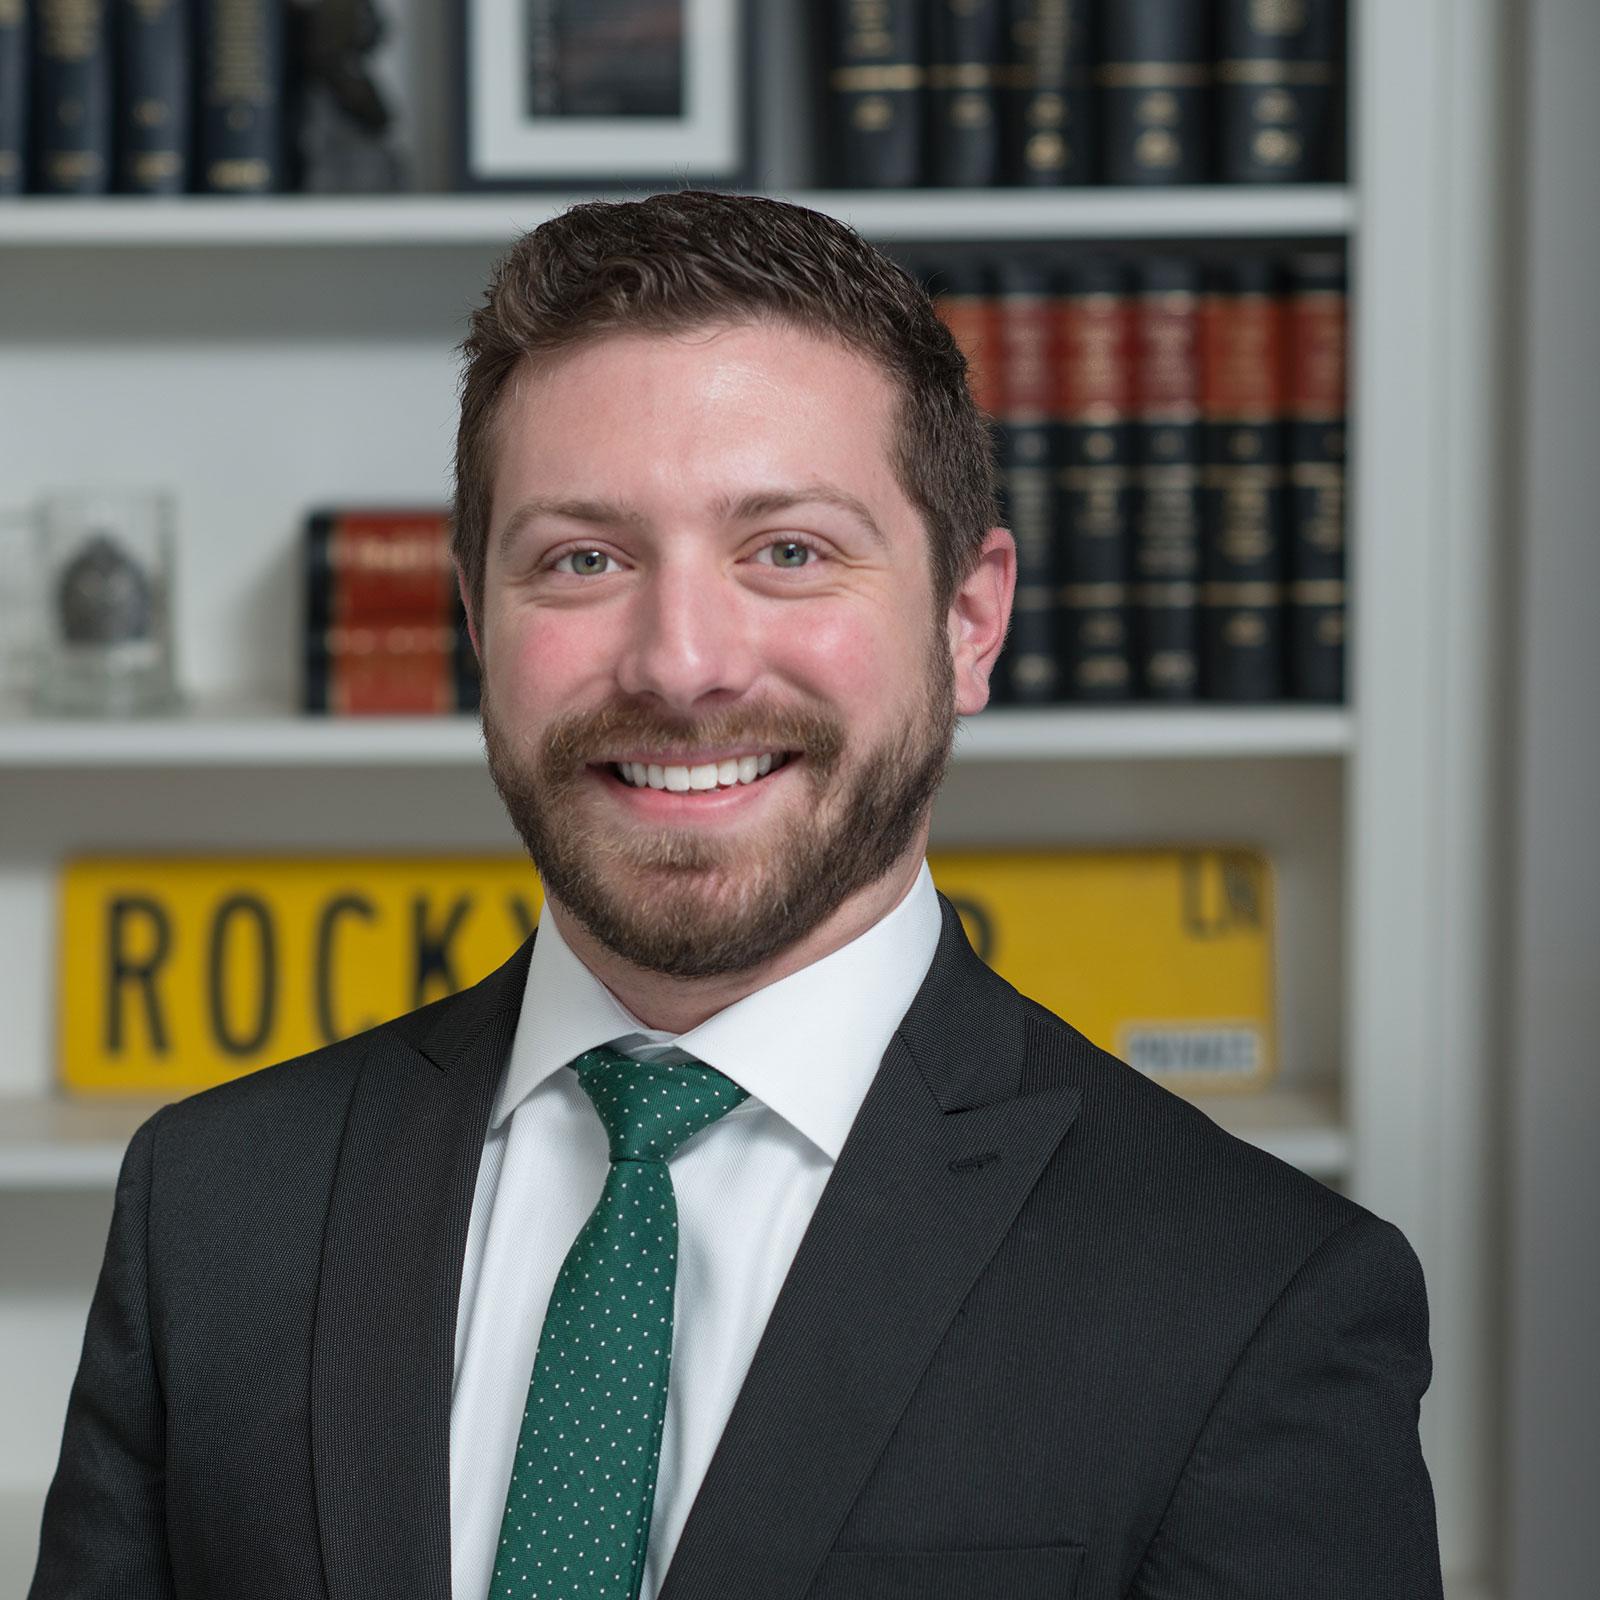 Head shot of Nicolas Bohorquez, a civil attorney serving Atlanta, Georgia and Fulton County.